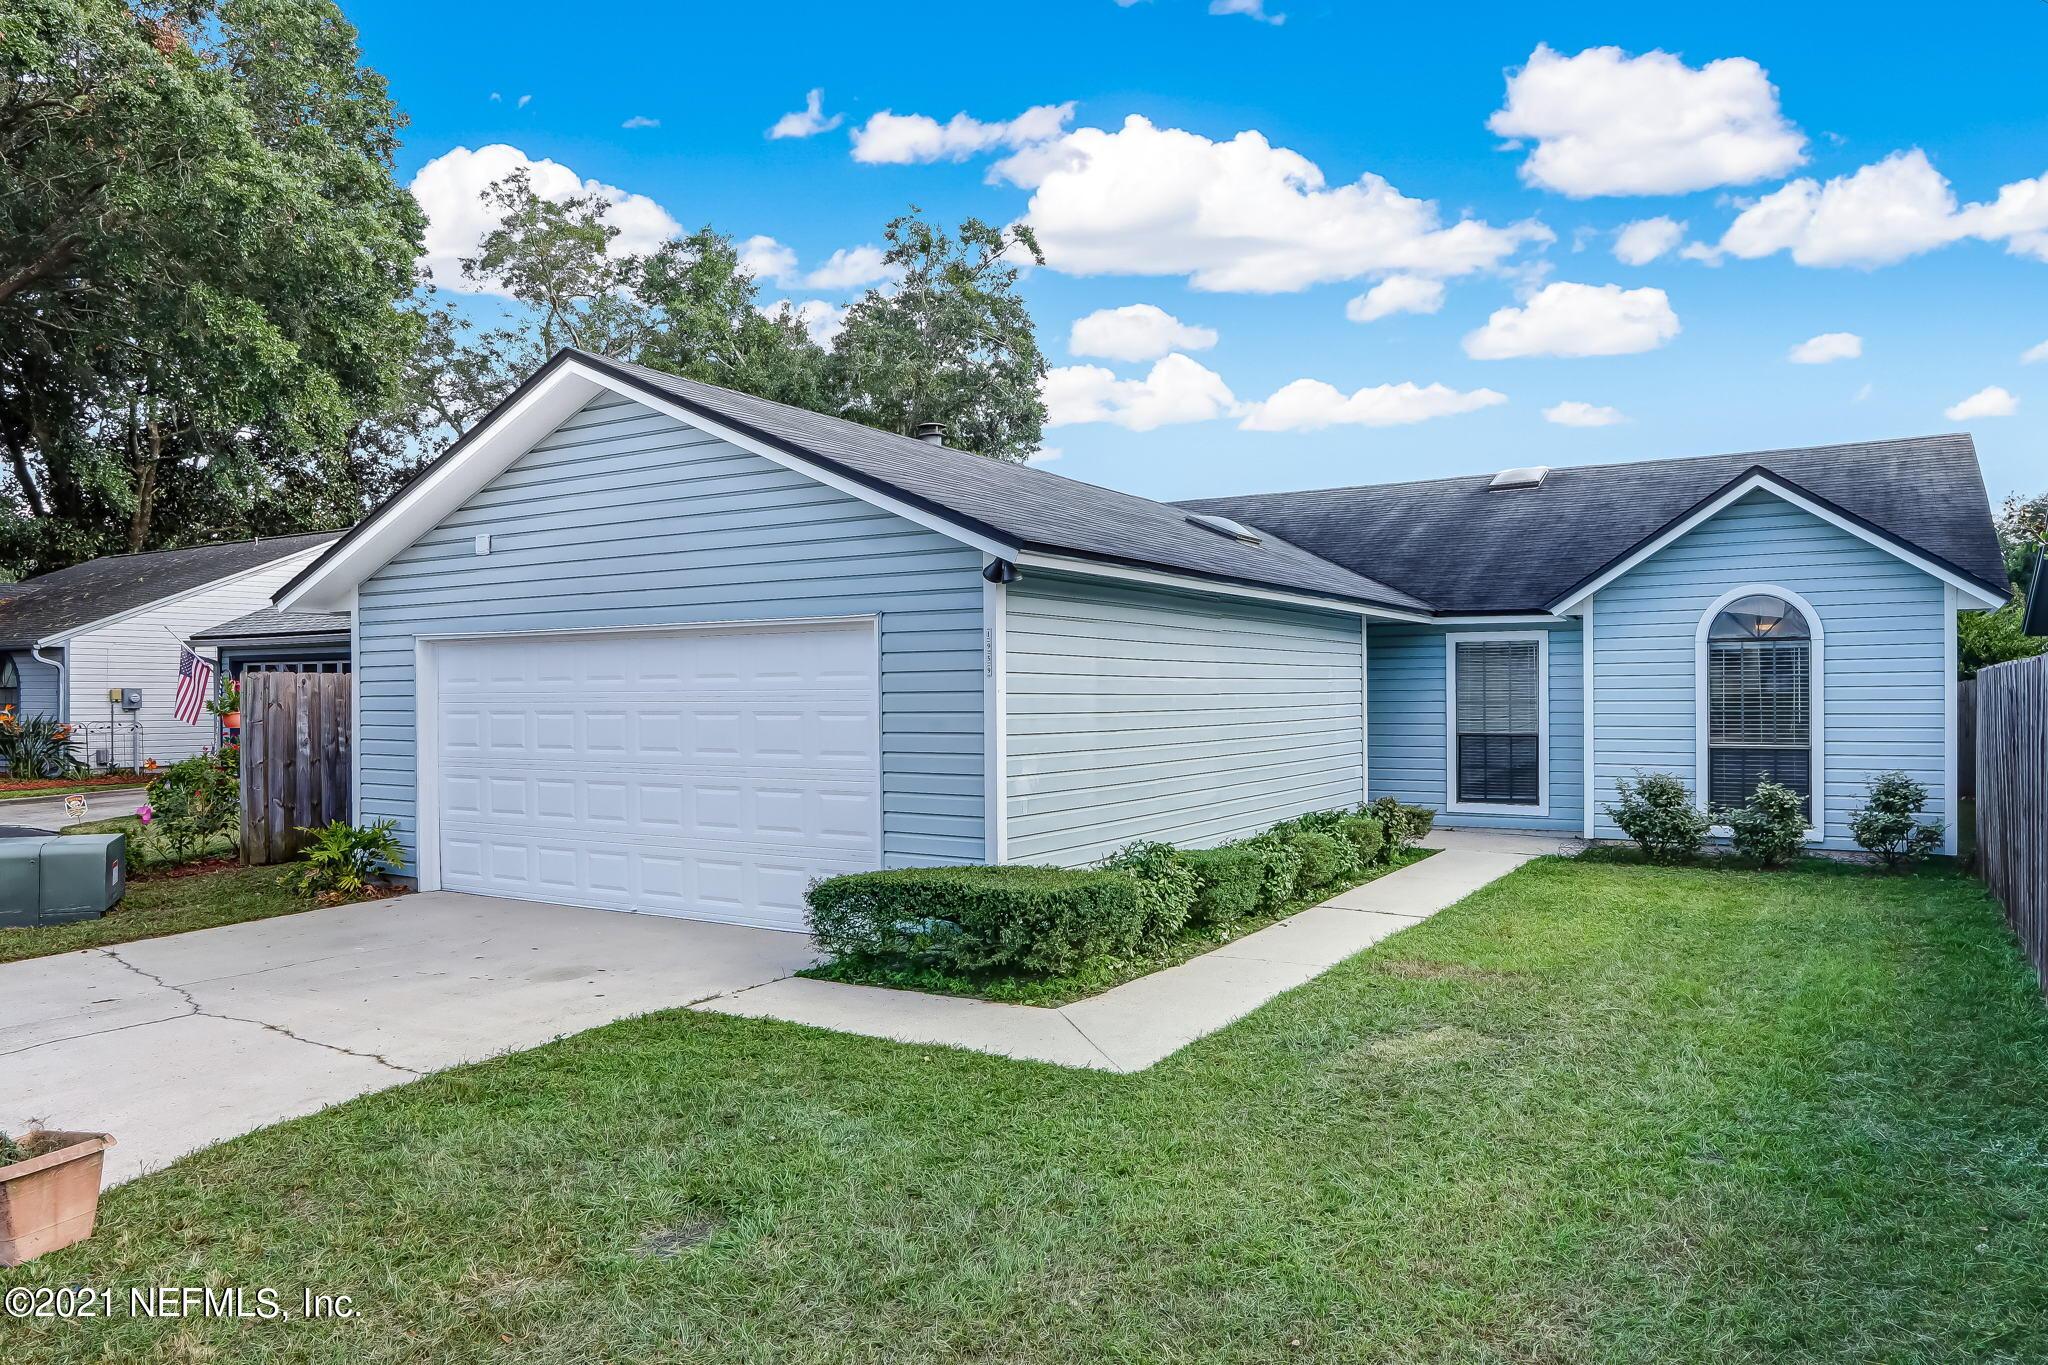 1959 ACORN, ORANGE PARK, FLORIDA 32073, 3 Bedrooms Bedrooms, ,2 BathroomsBathrooms,Residential,For sale,ACORN,1136647